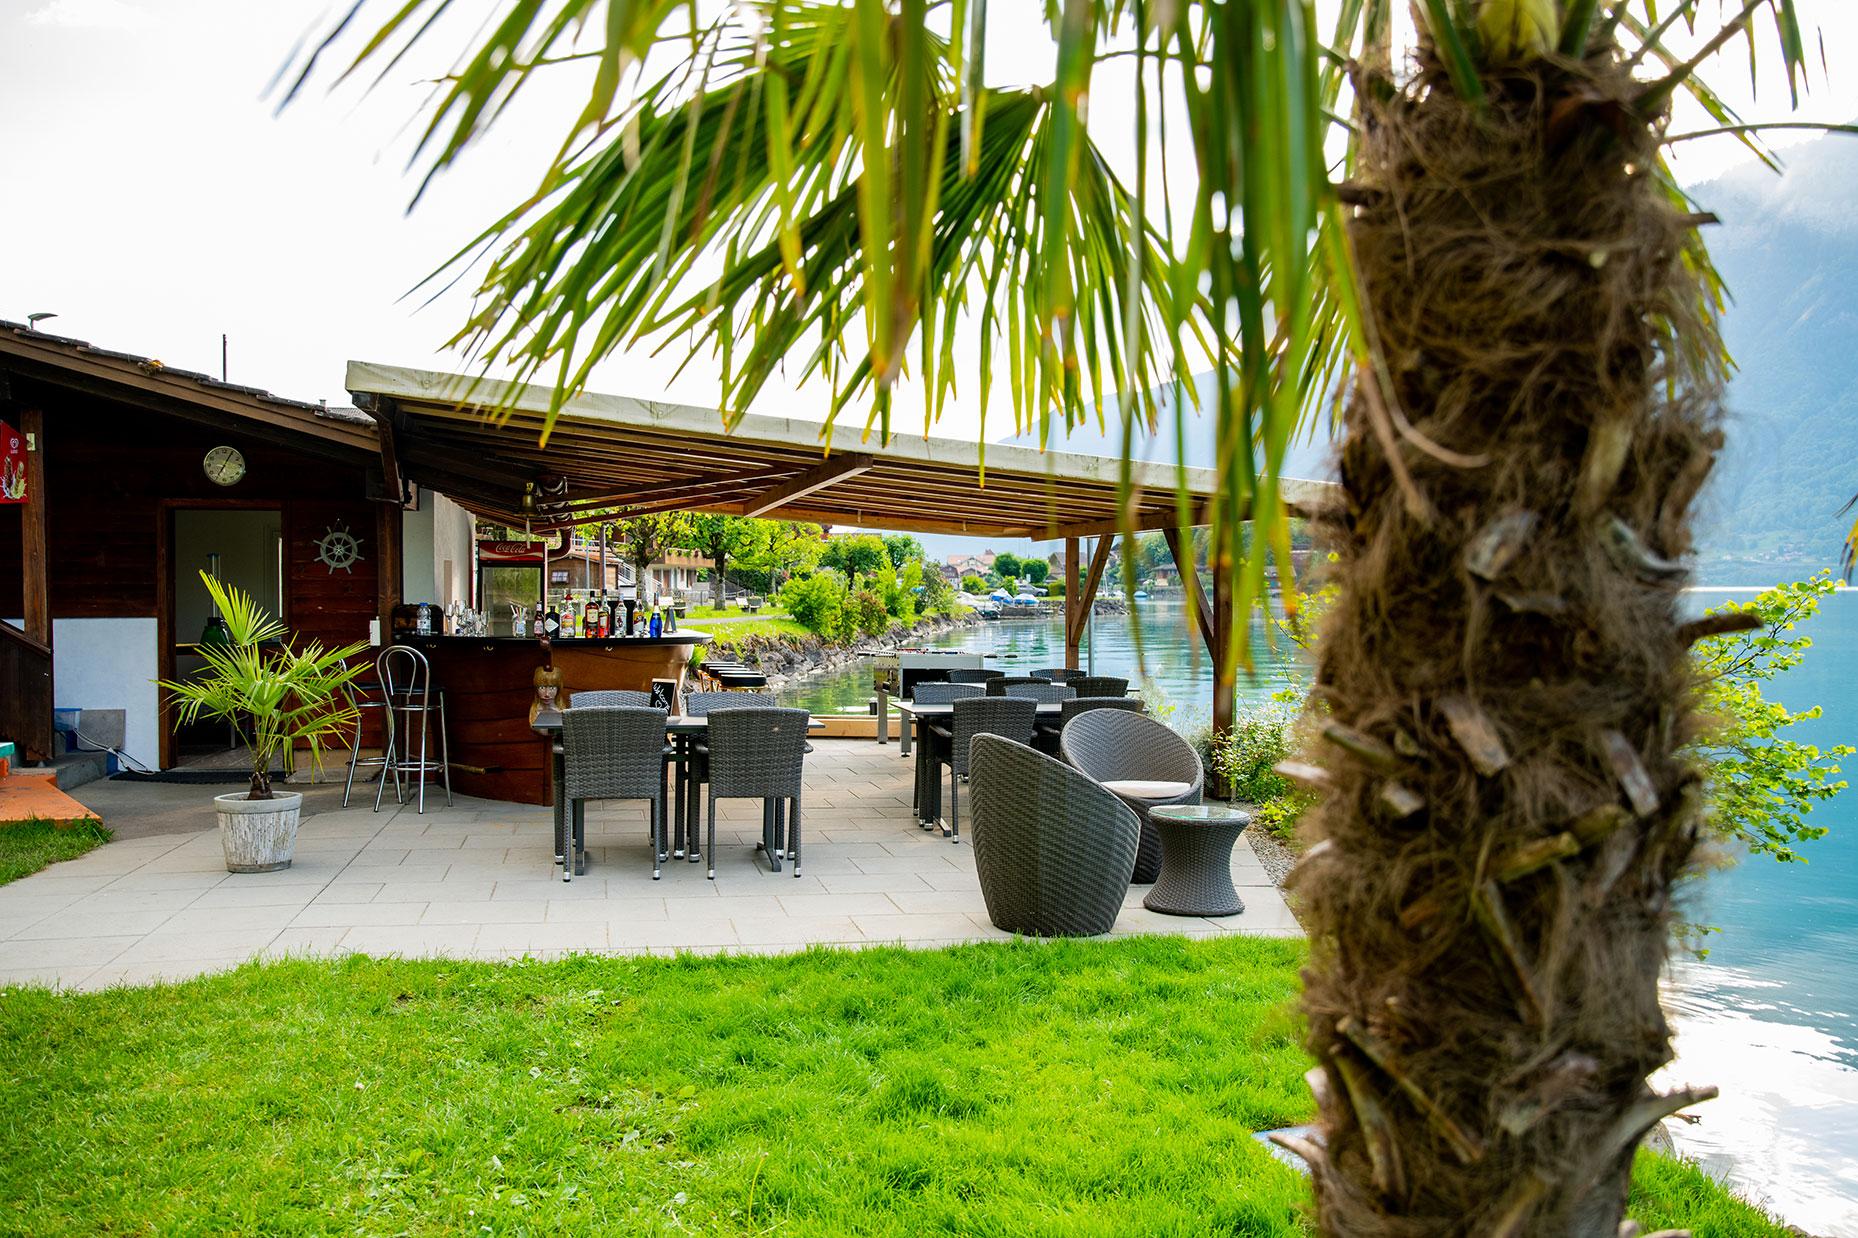 strandbad-iseltwald-terrasse-palme